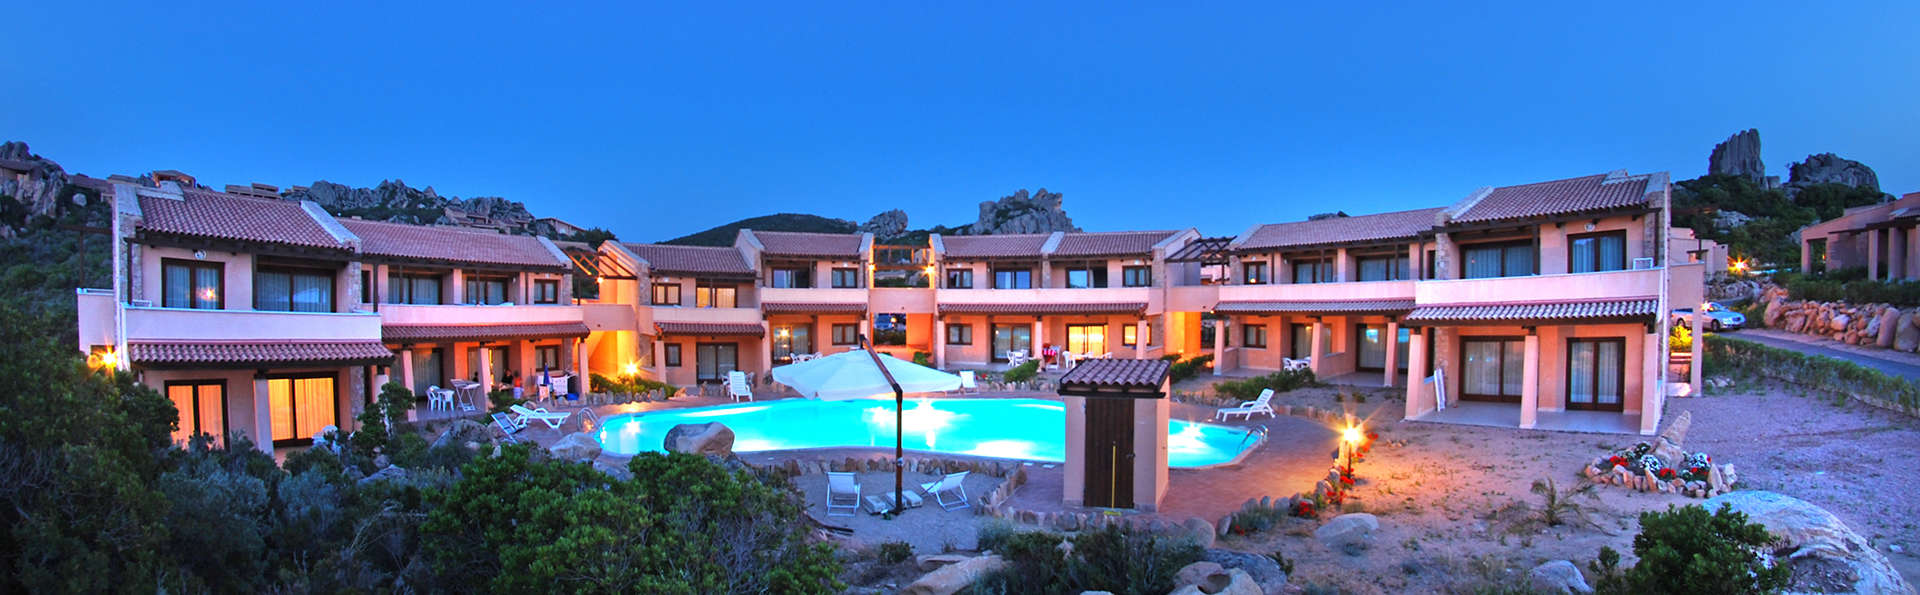 Gravina Resort - edit_front2.jpg